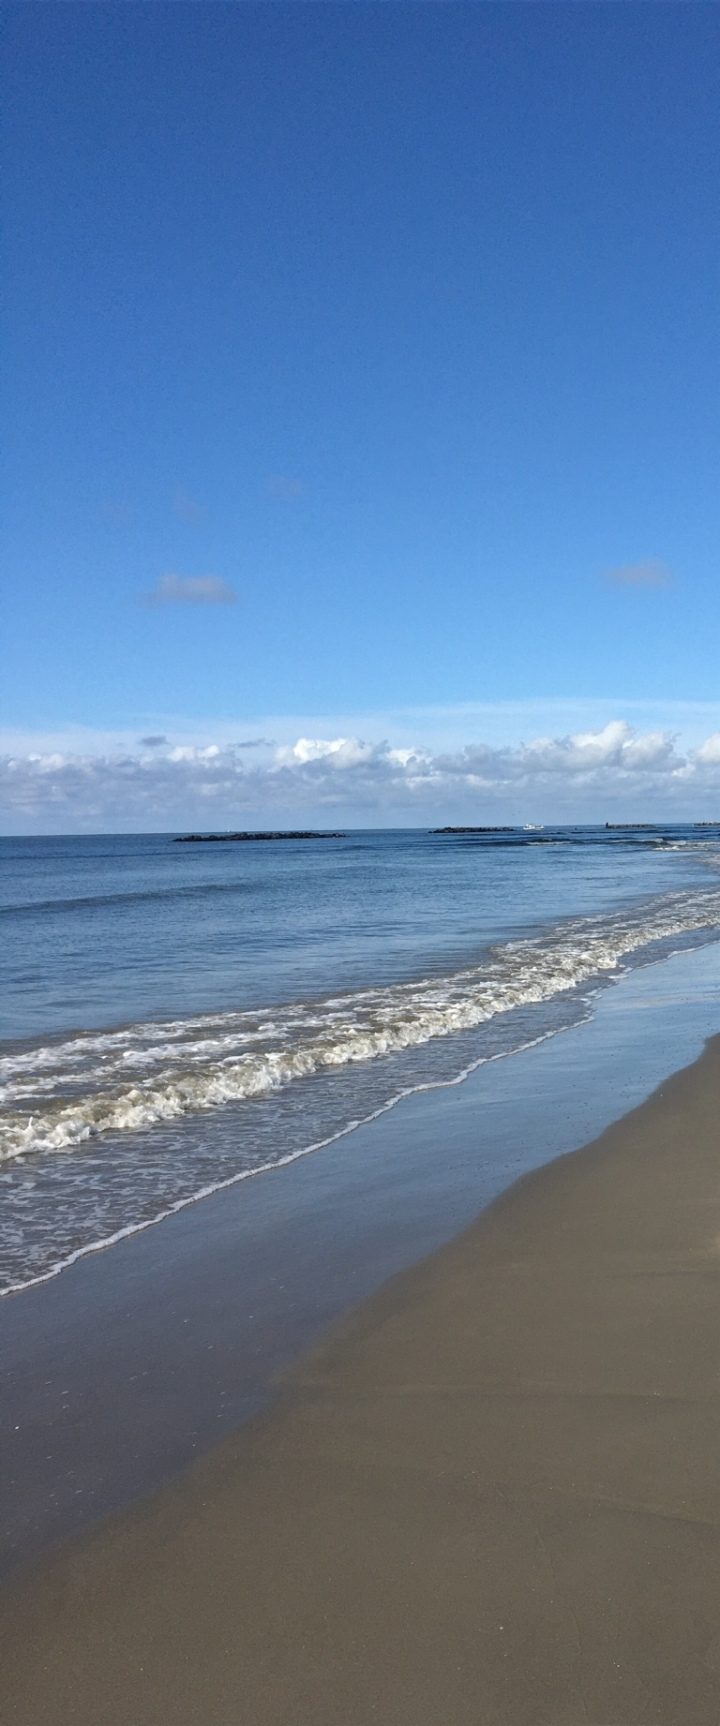 Morning Walks 2 - Grand Isle 2016